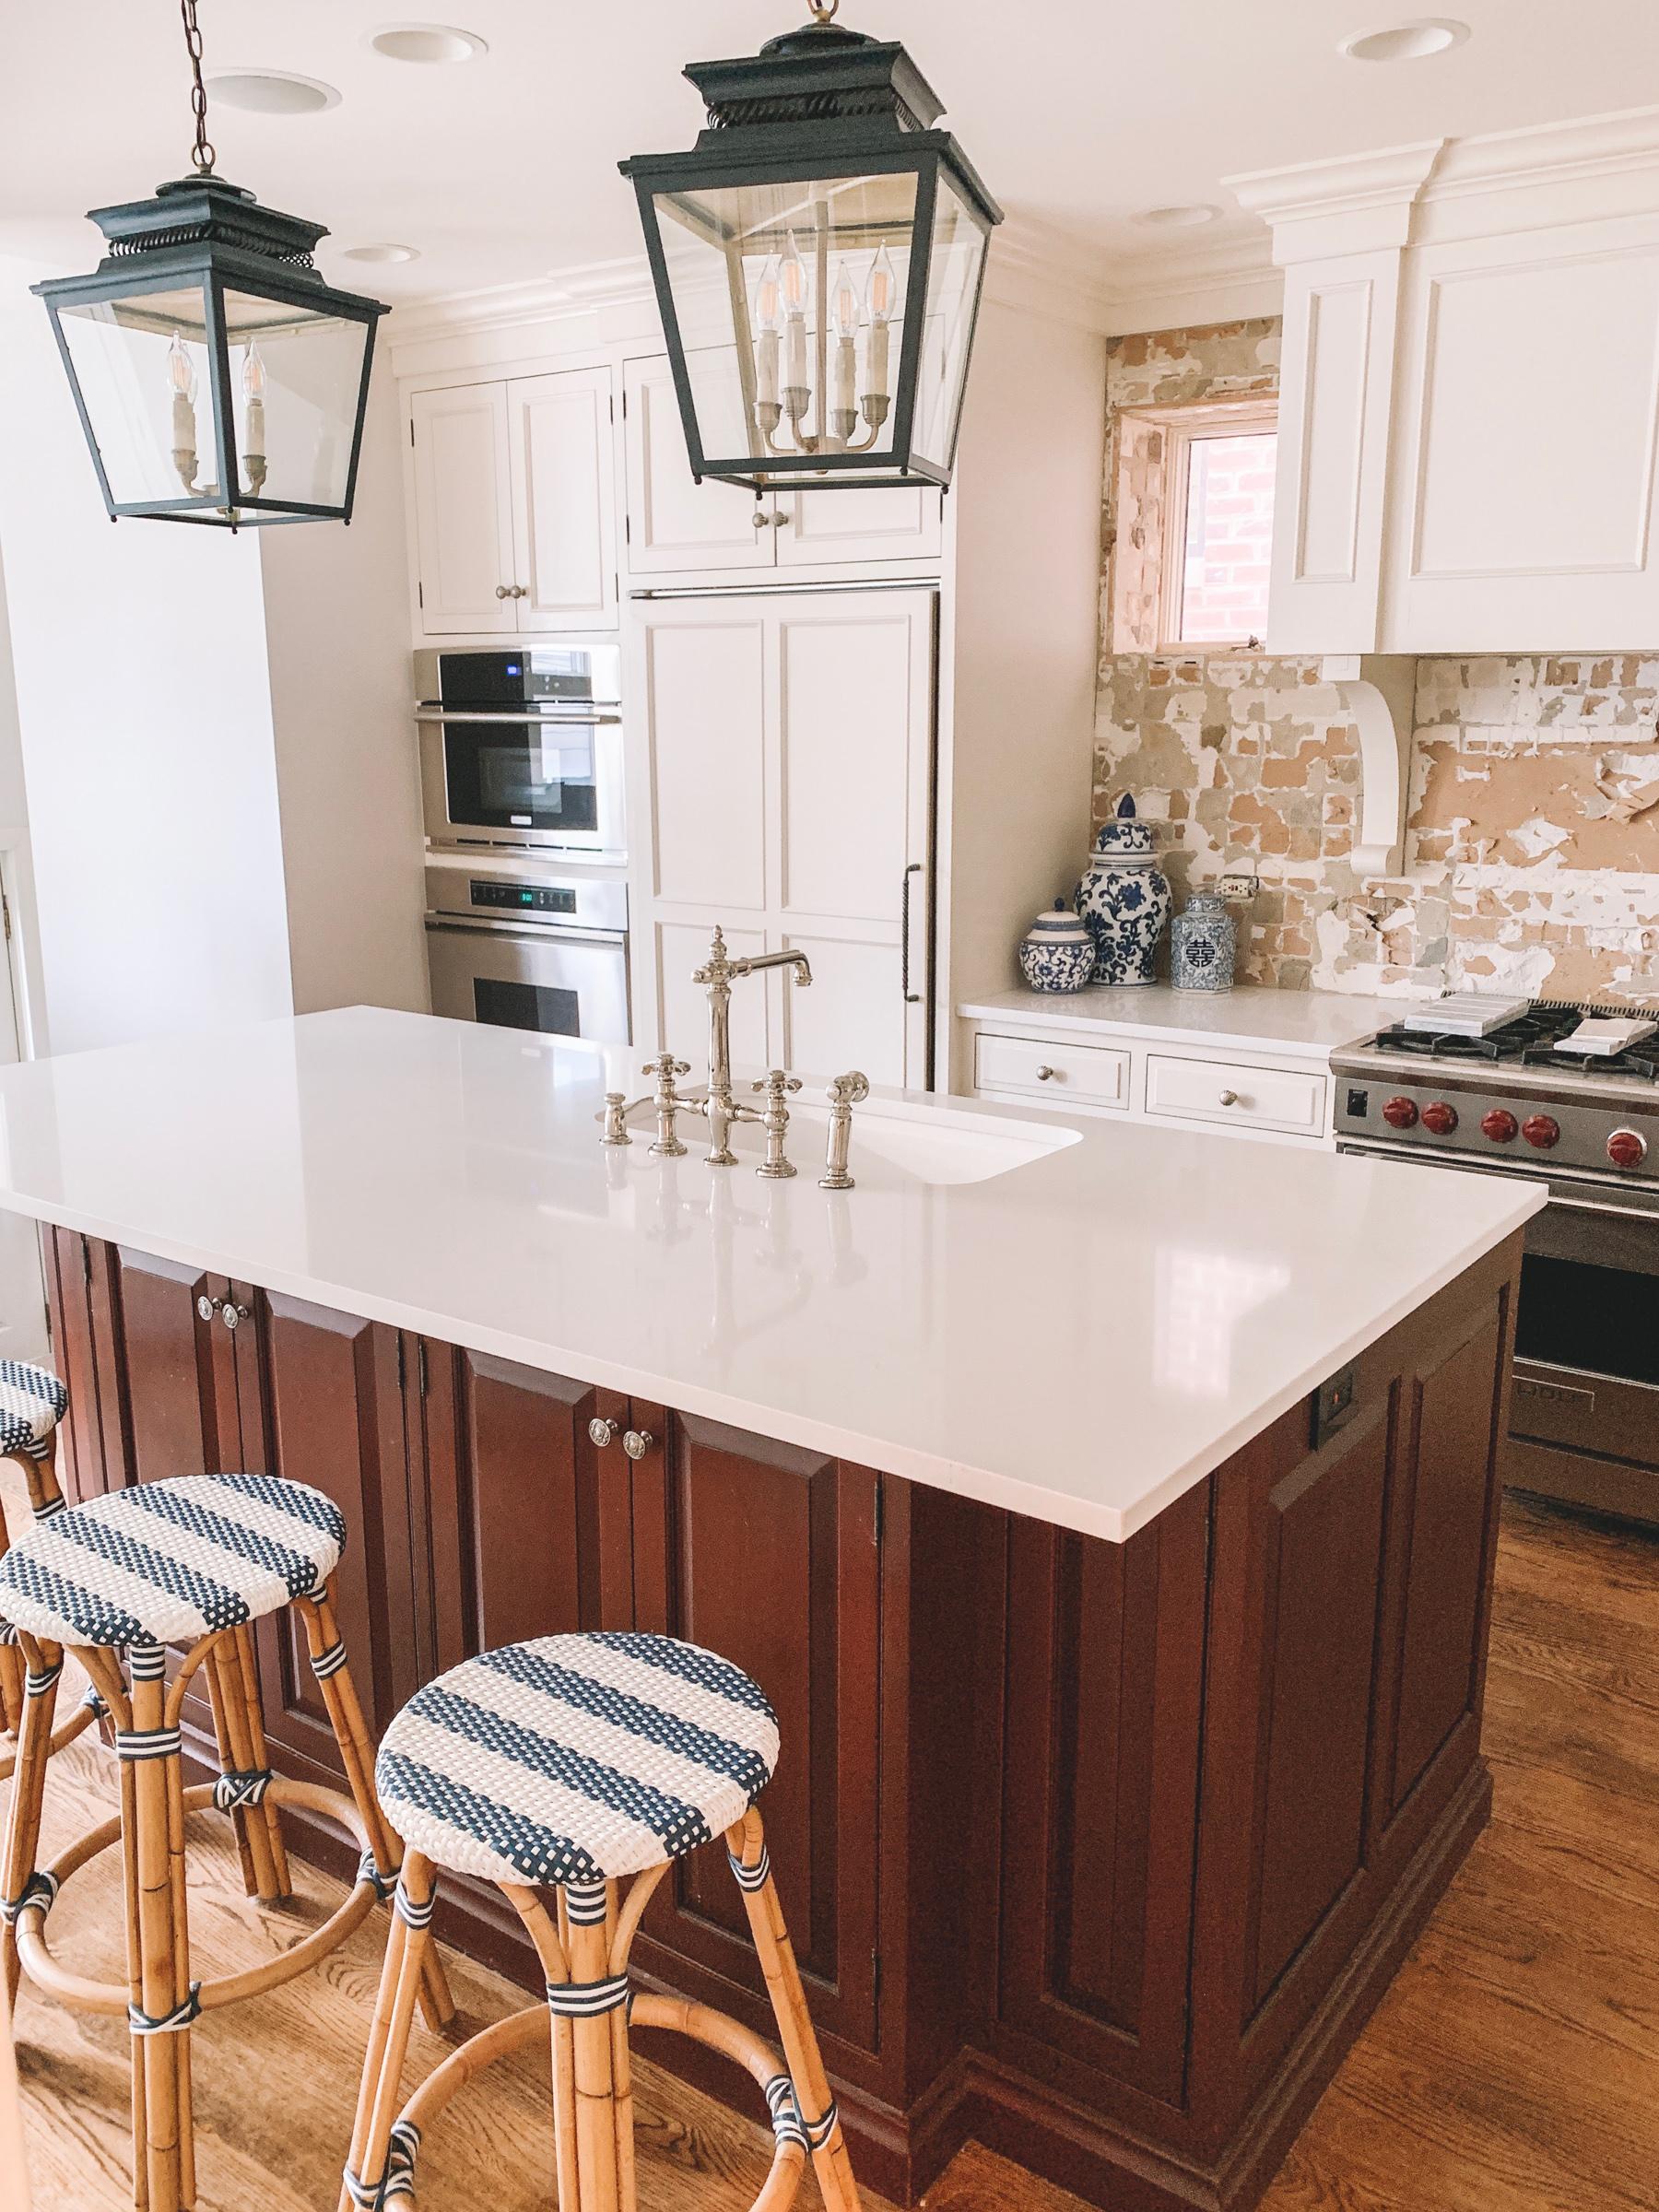 kitchen countertop - after: quartz countertops